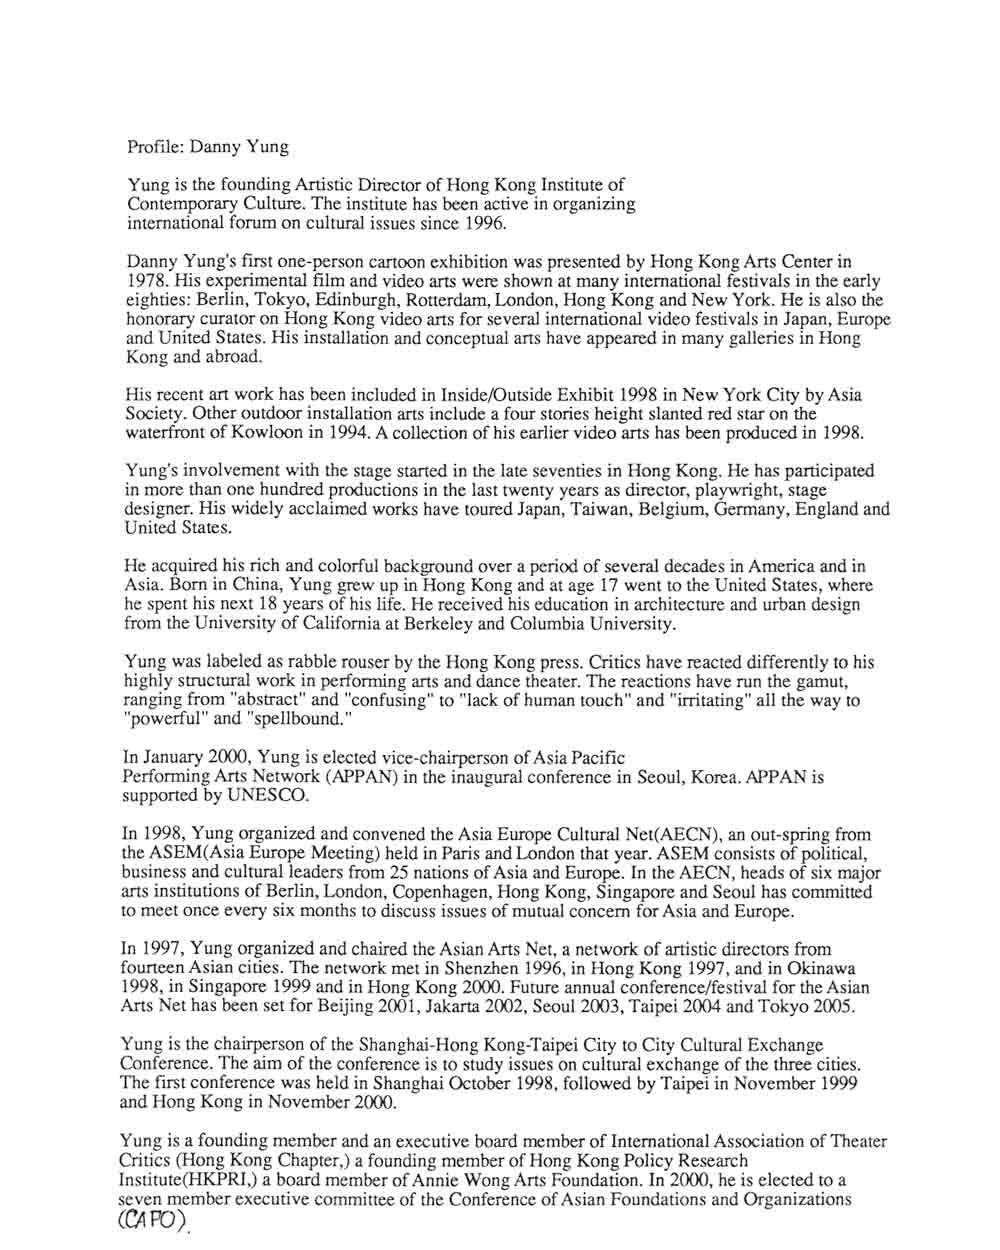 Danny Yung's Artist Biography, pg 1